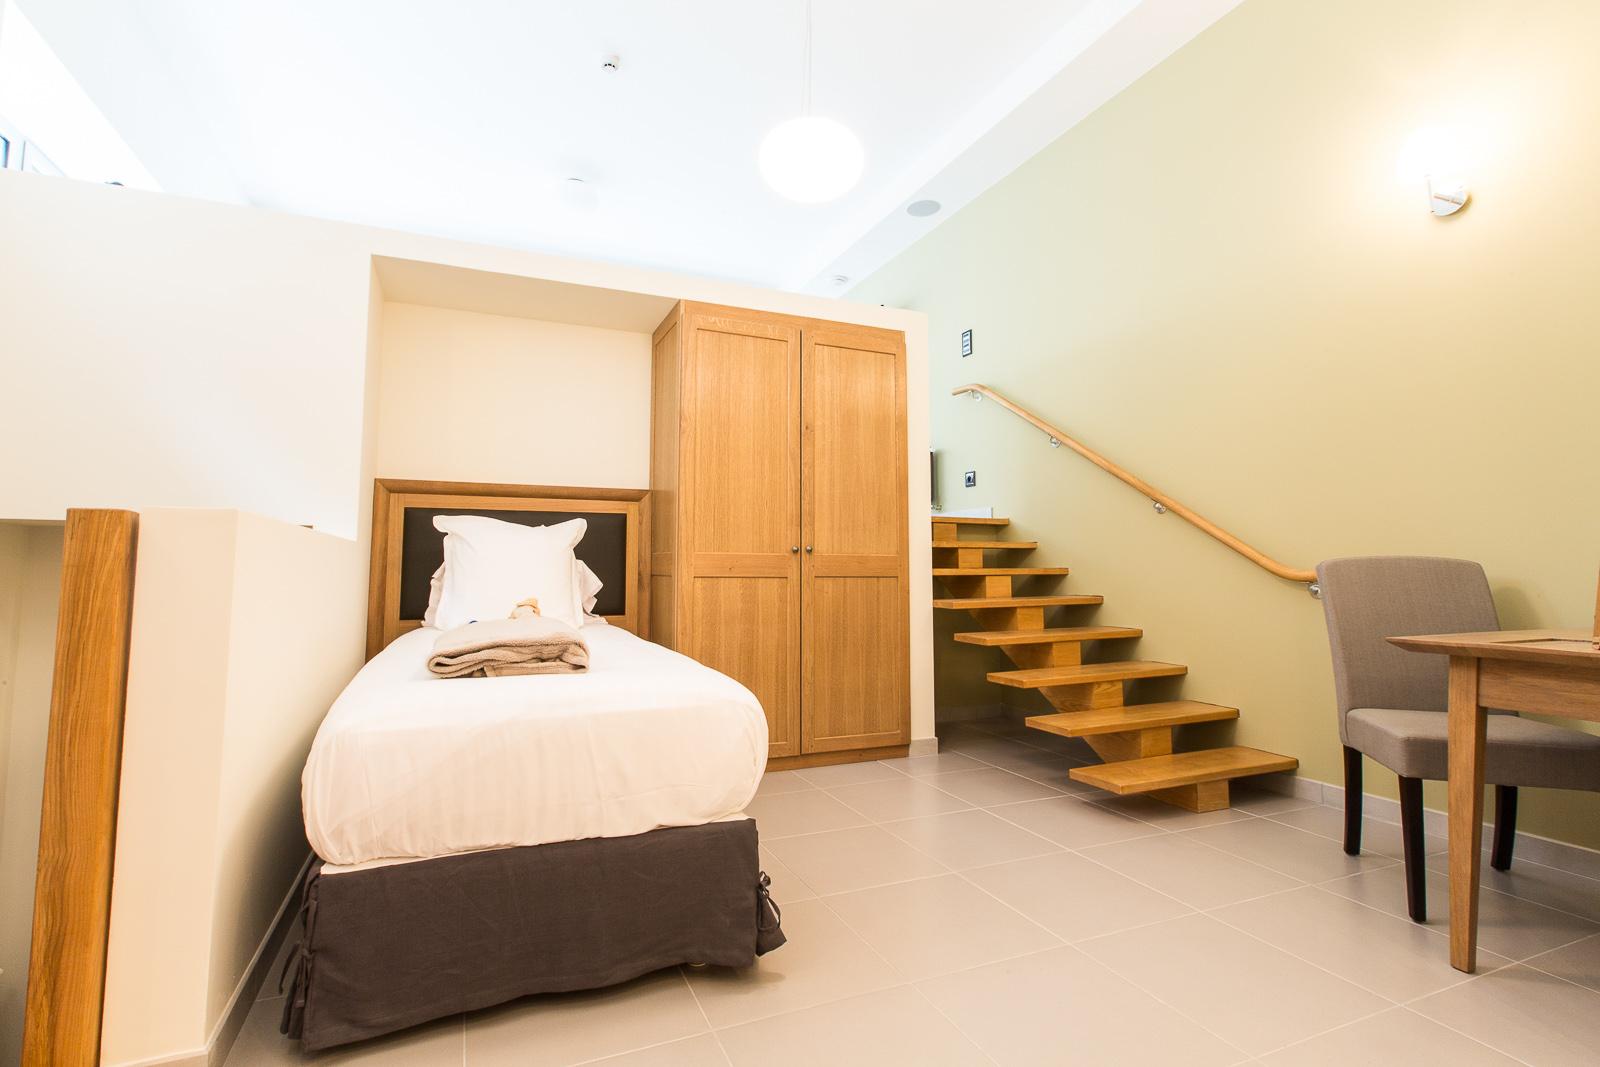 Hotel marotte suite balneo lit simple